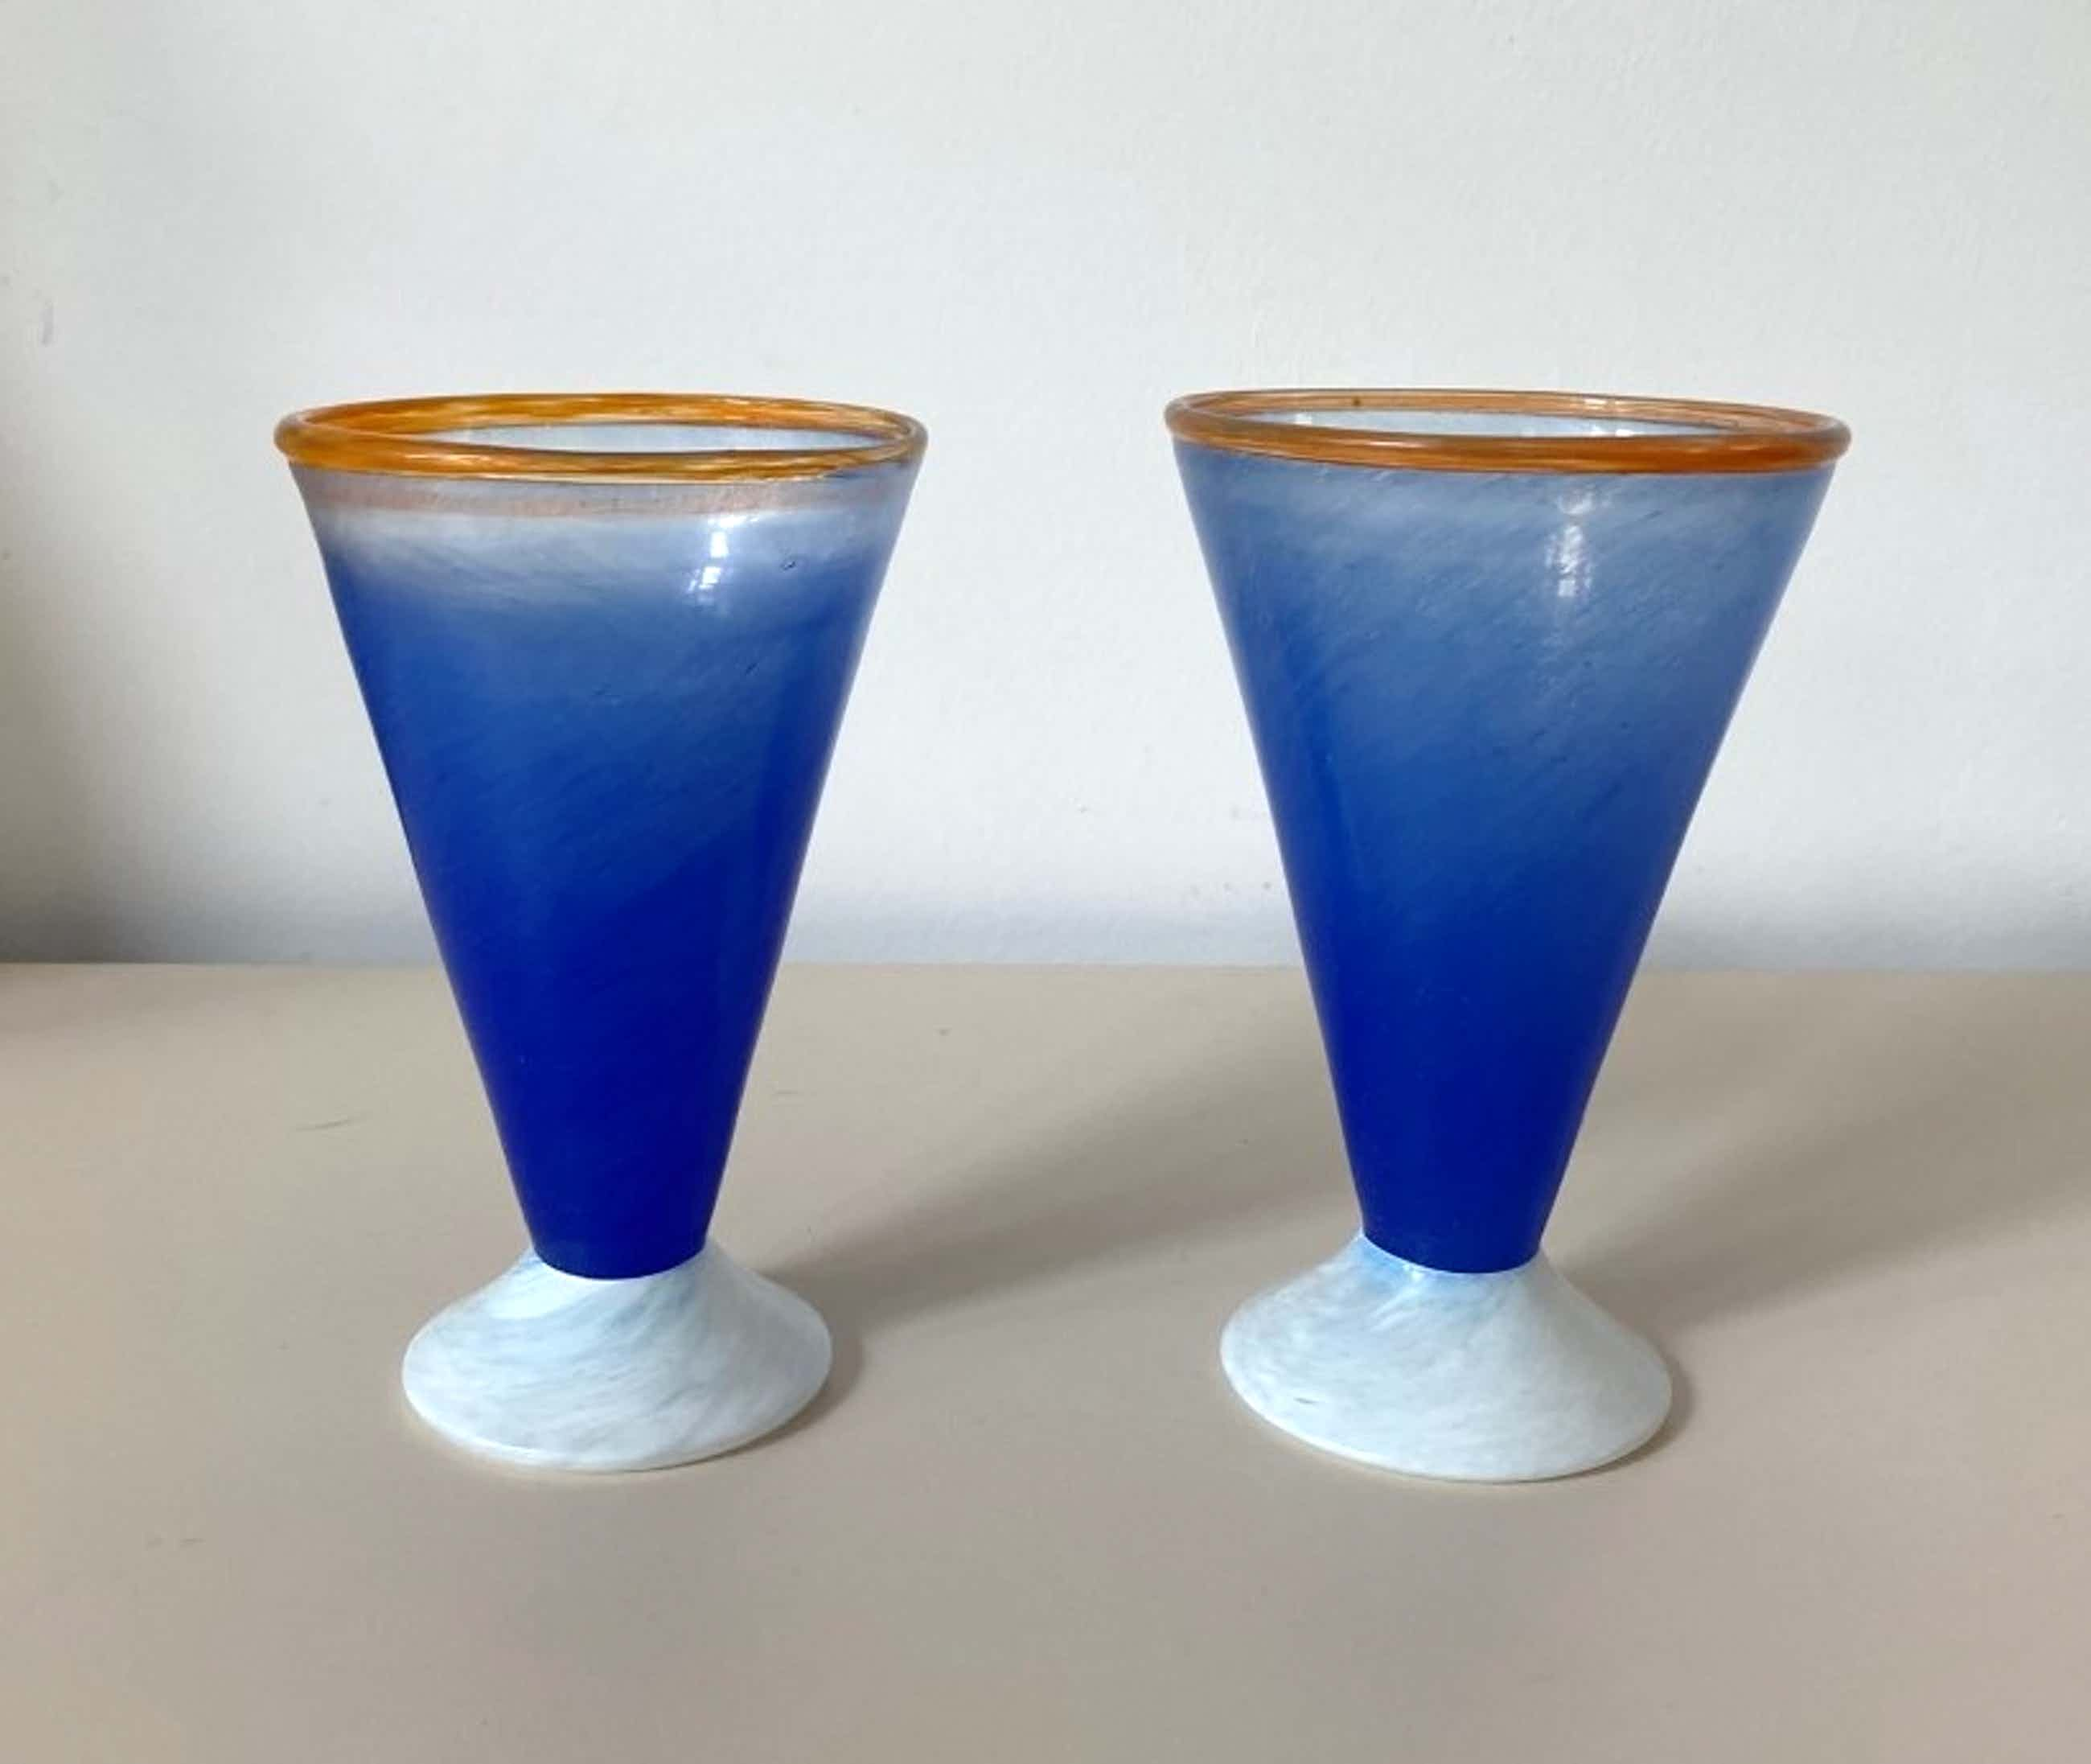 Niet of onleesbaar gesigneerd - Jema Boda Glasbruk - twee gekleurde vaasjes - A. Gray kopen? Bied vanaf 5!